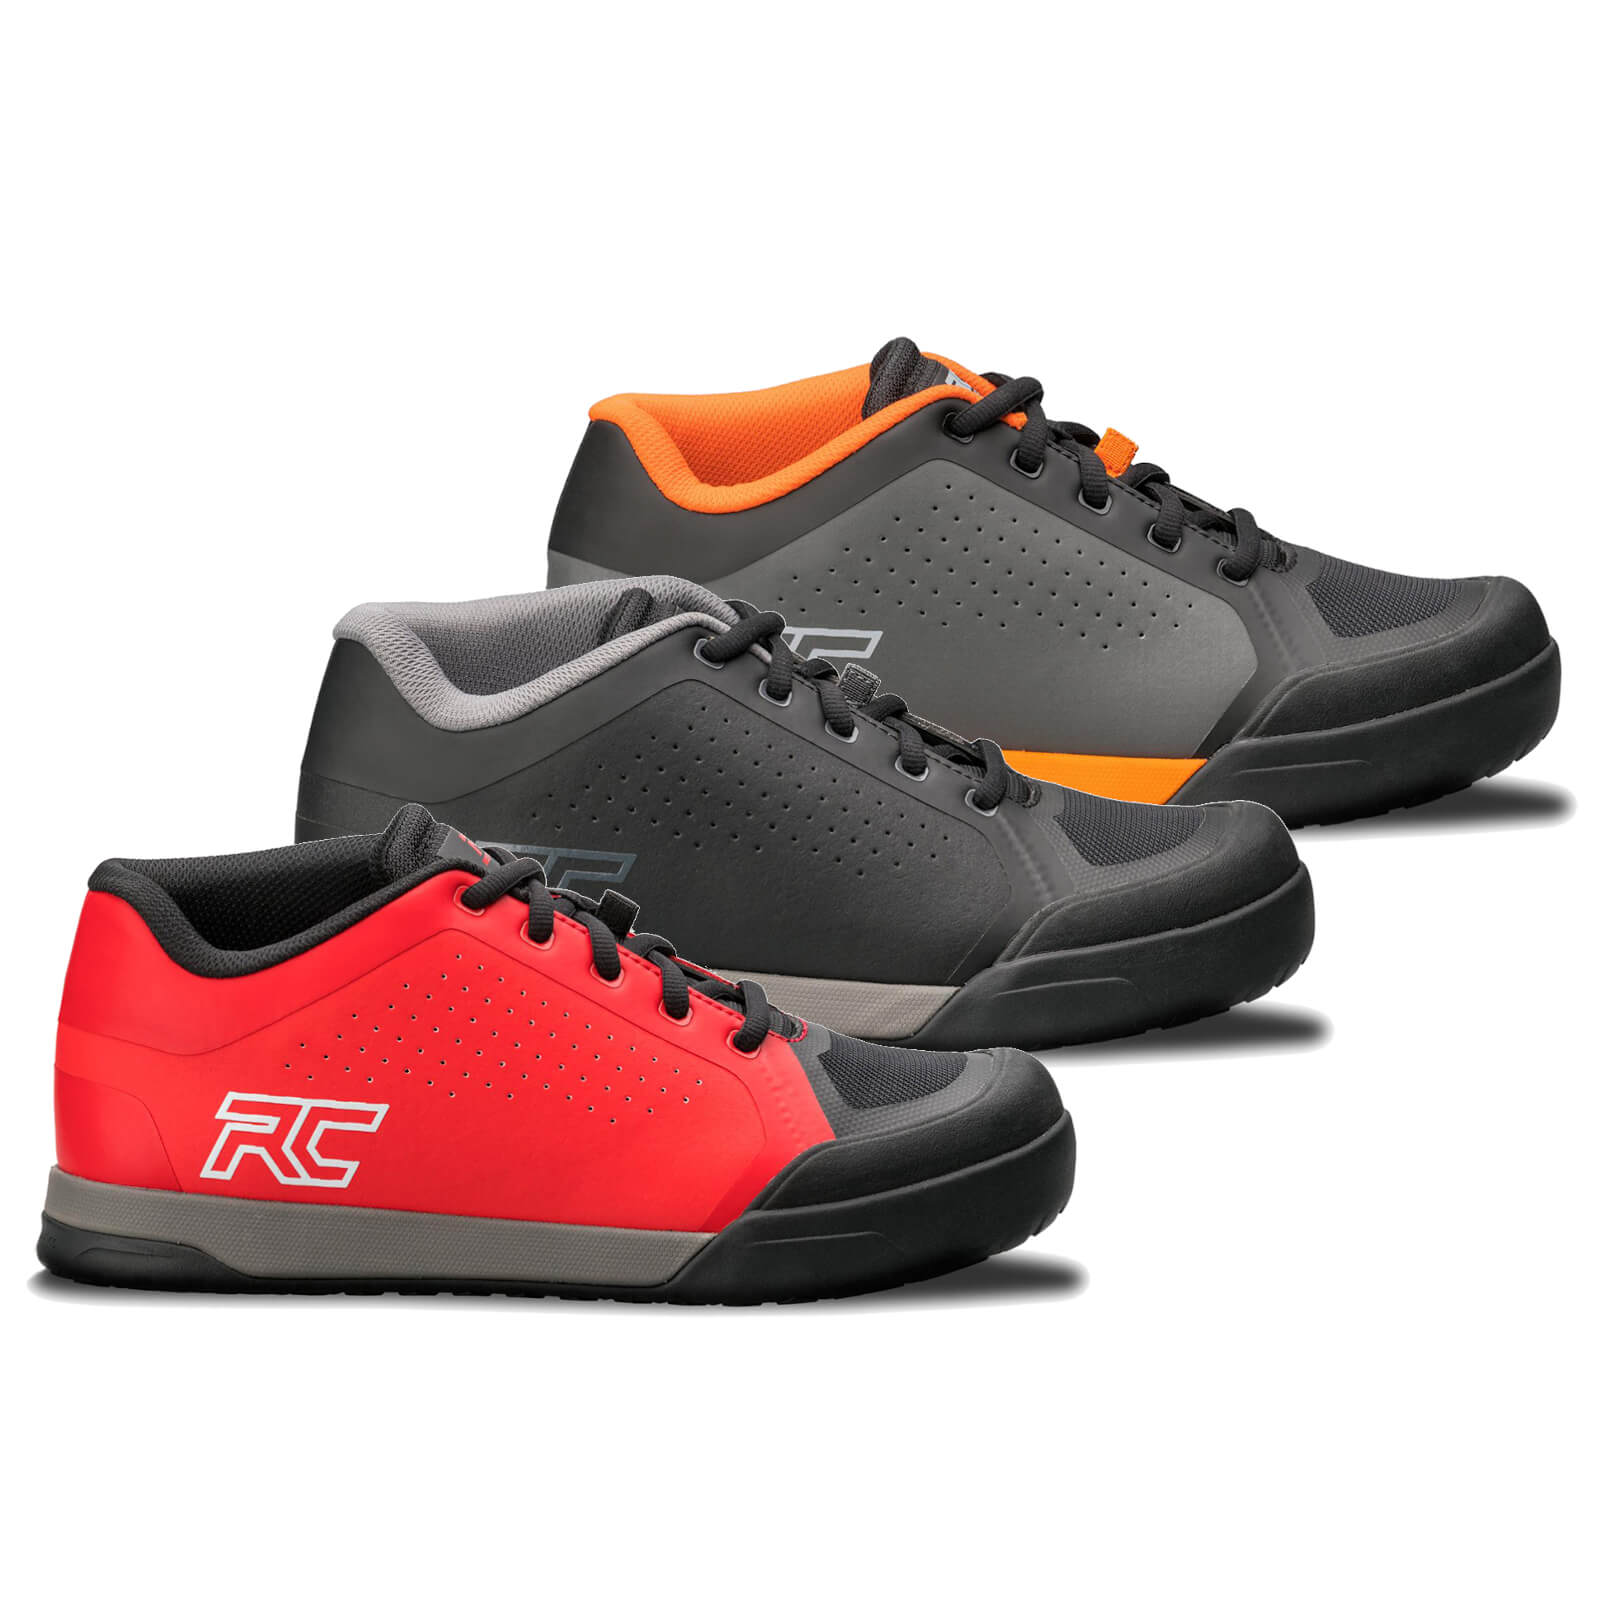 Sidi Sixty Road Shoes - Black/black - Eu 45.5